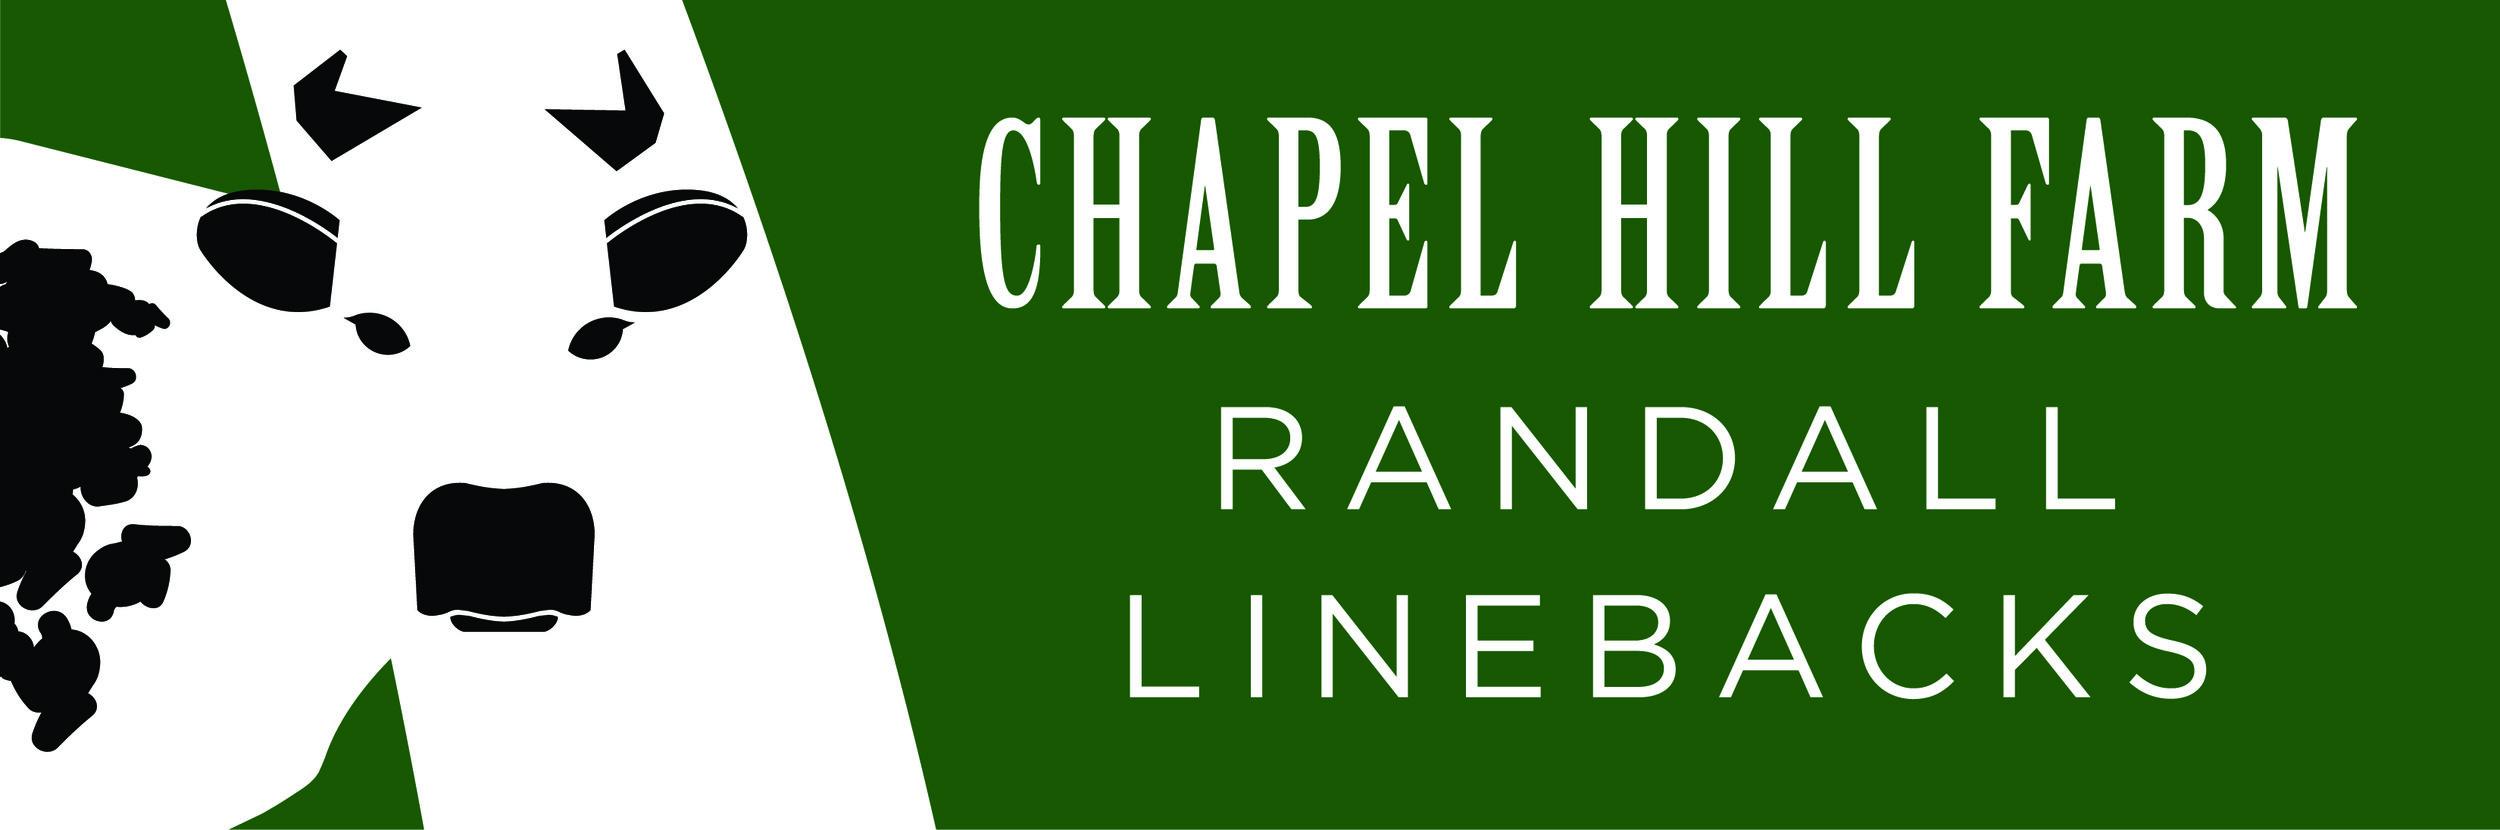 ChapelHillFarm_preferred_color-01.jpg